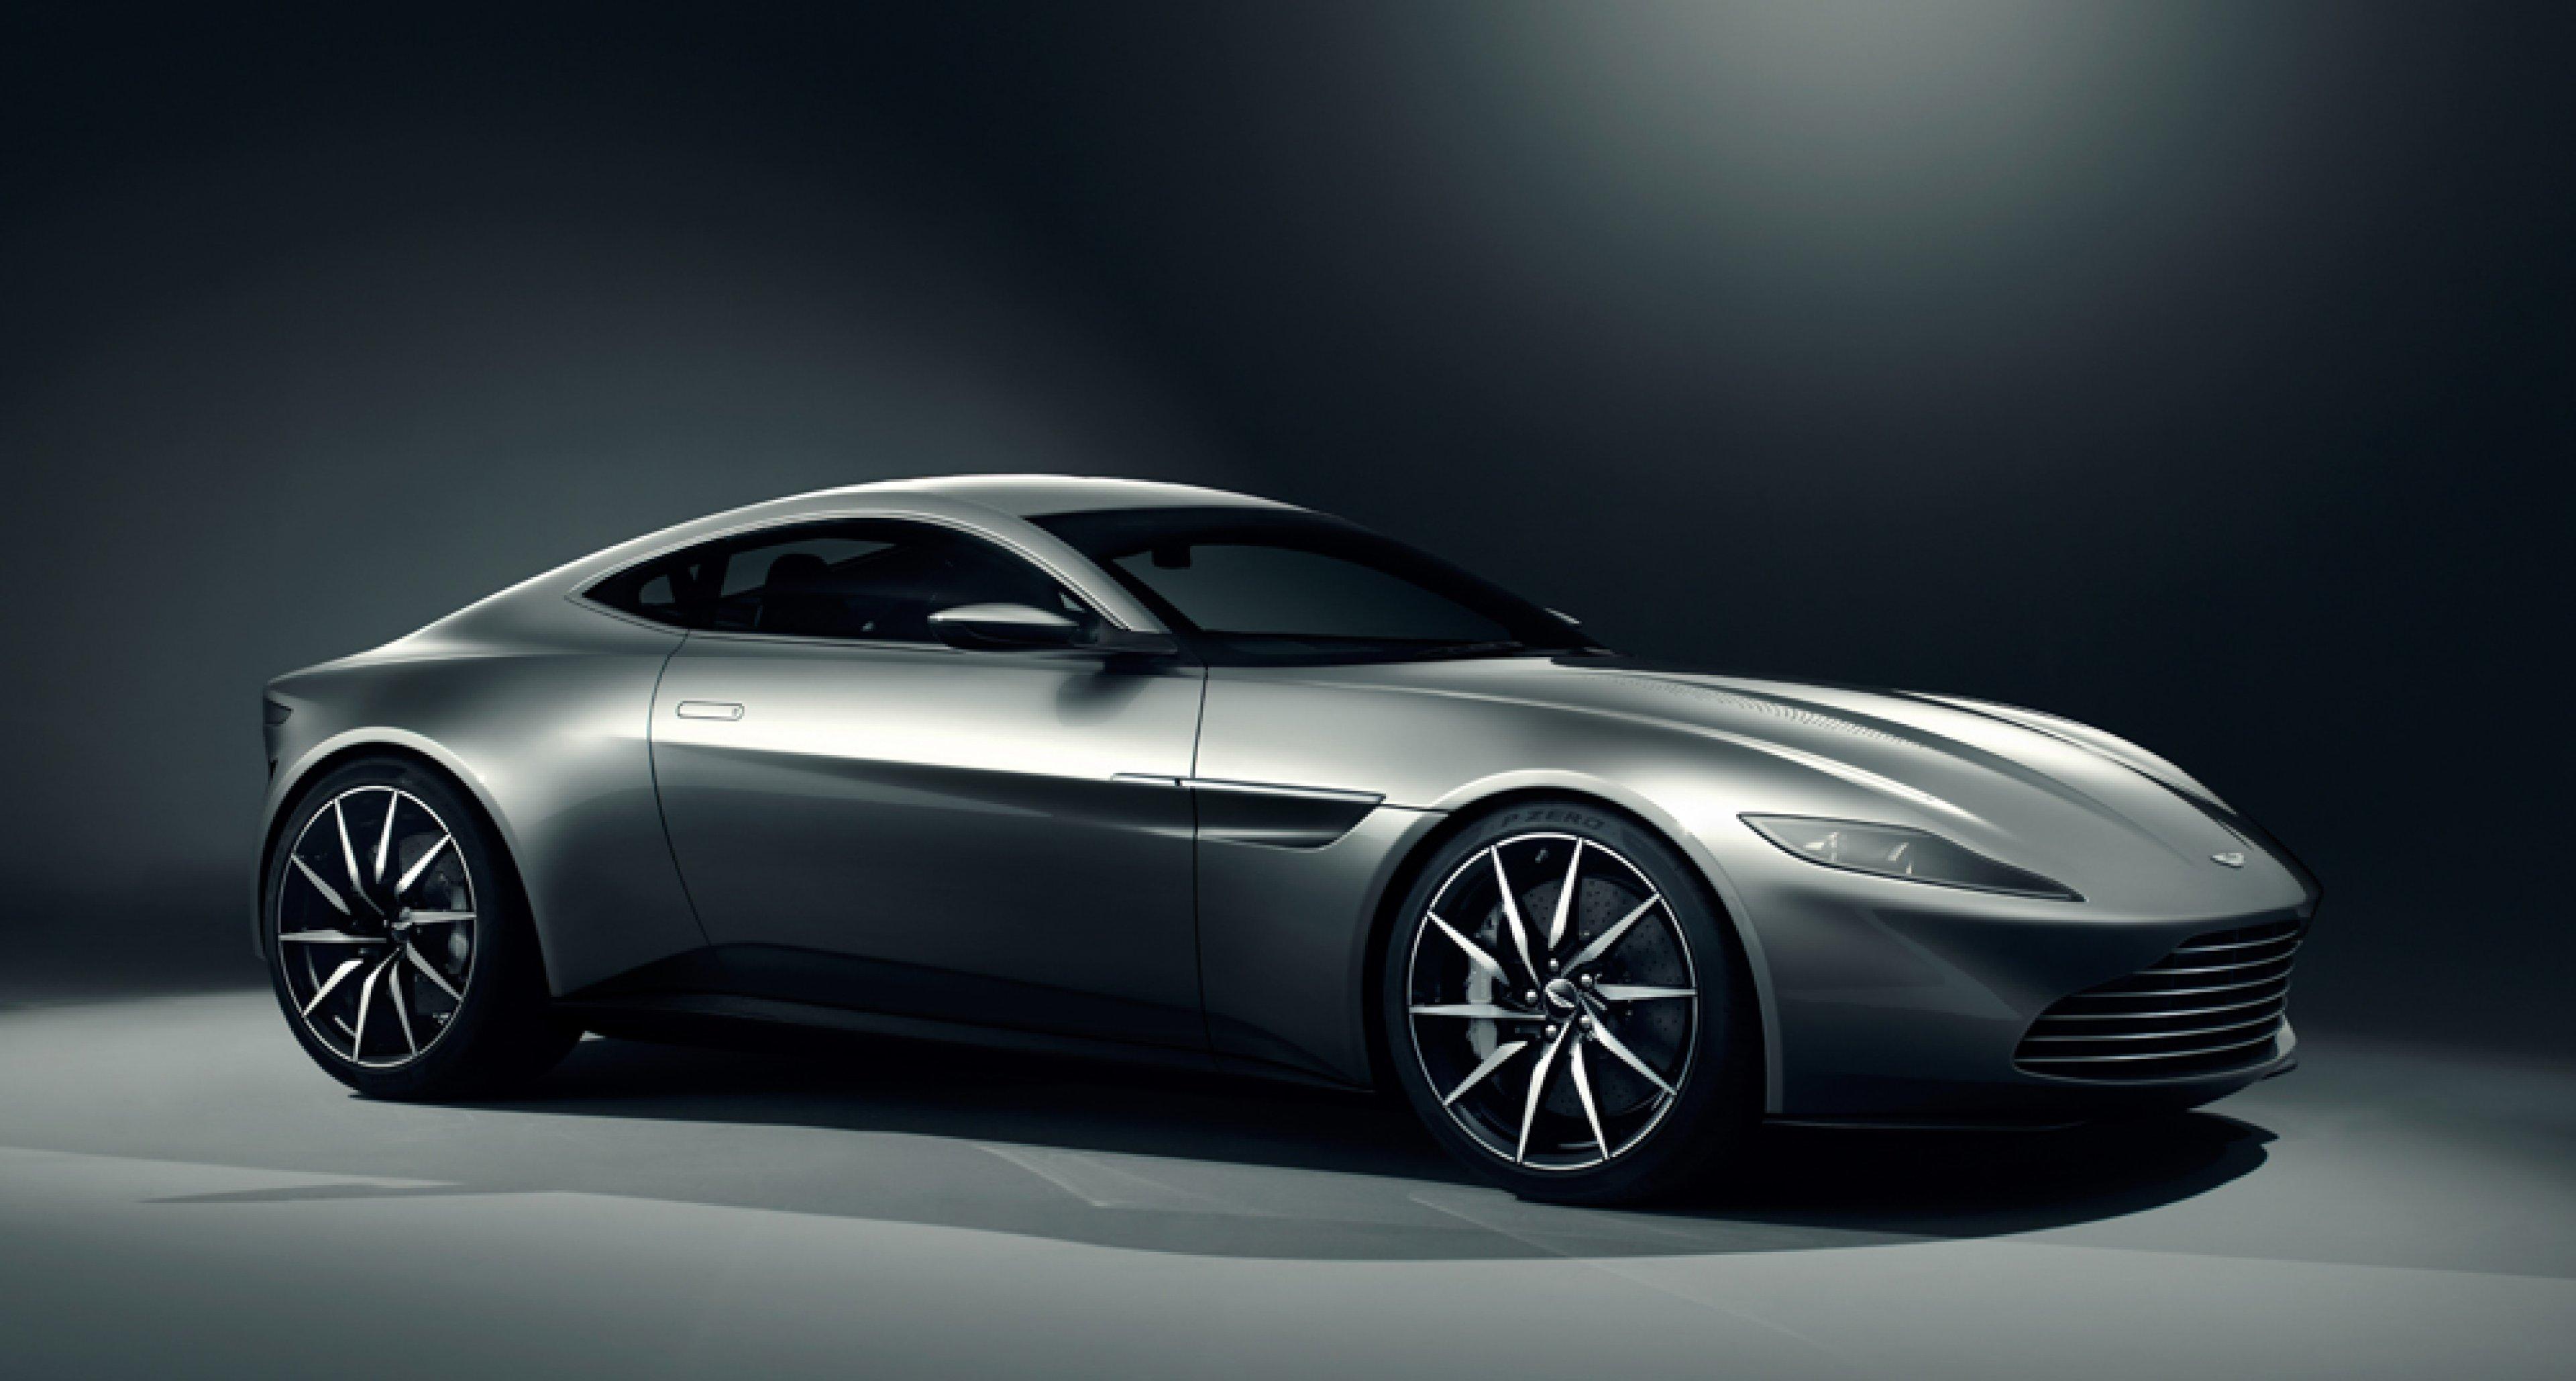 James Bond to drive new Aston Martin DB10 in 'Spectre ...